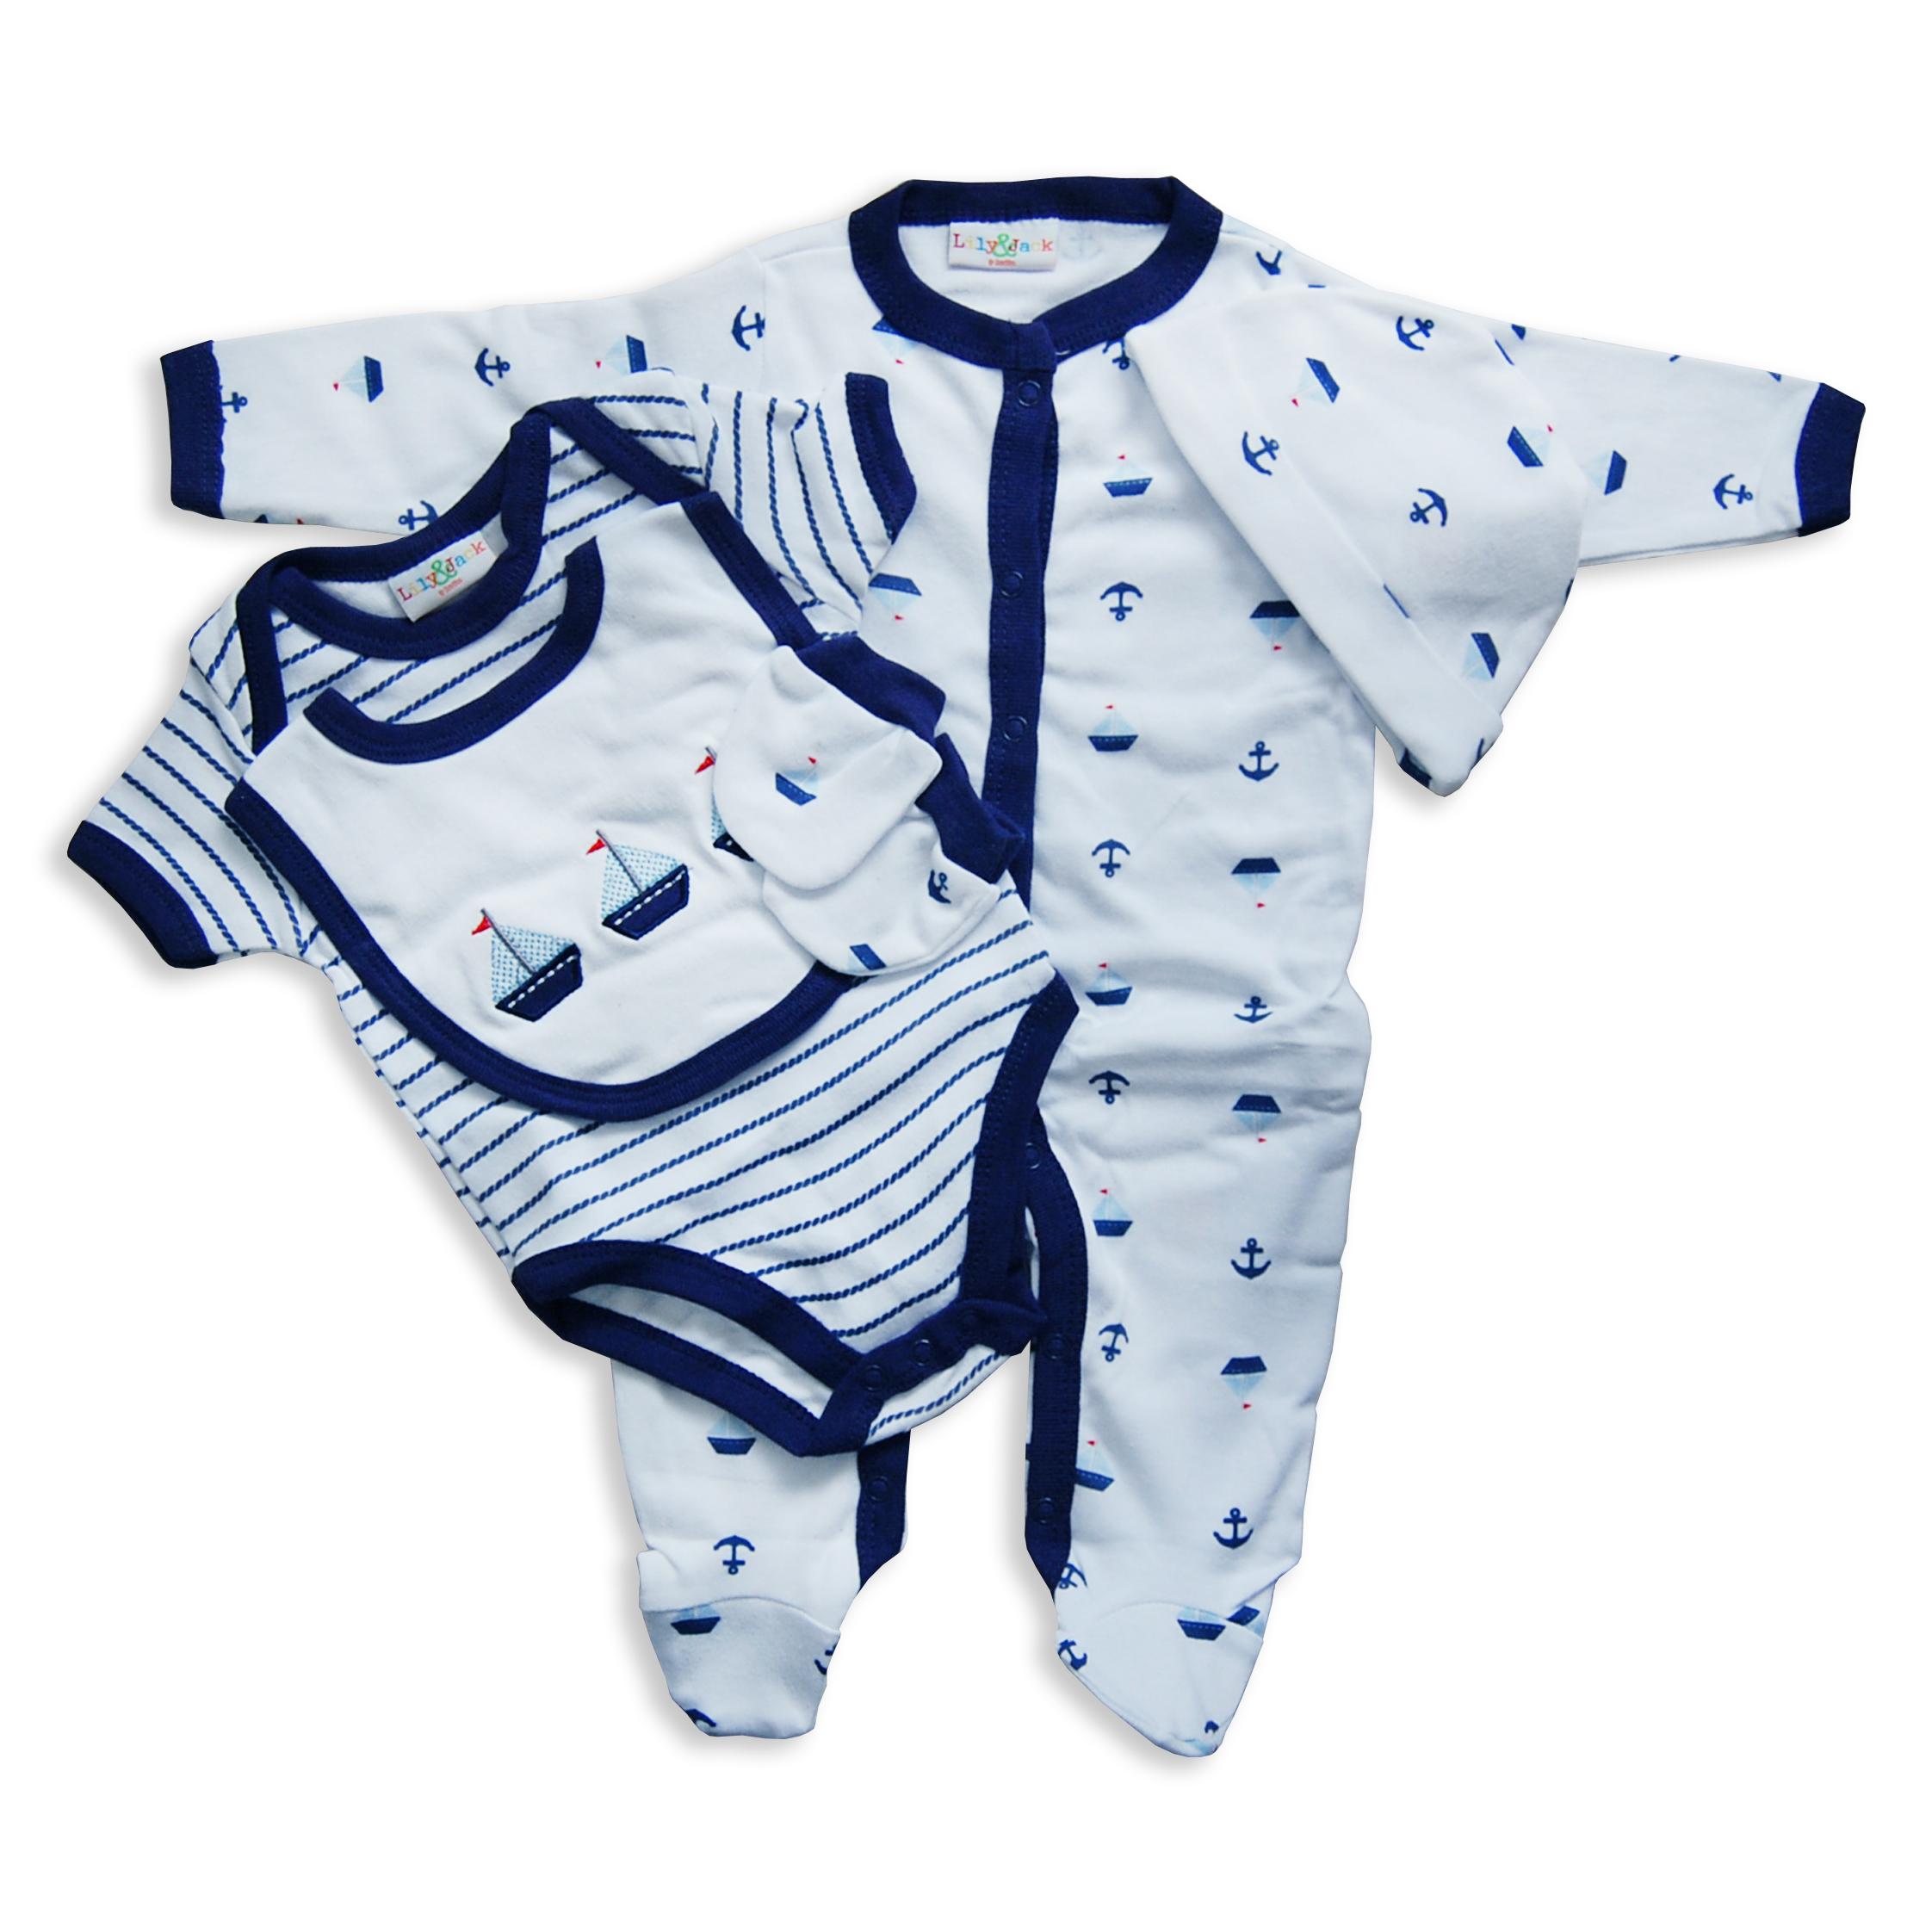 629310028dde Newborn Baby Girl Dresses (0-24 Months) - Bloomingdale s